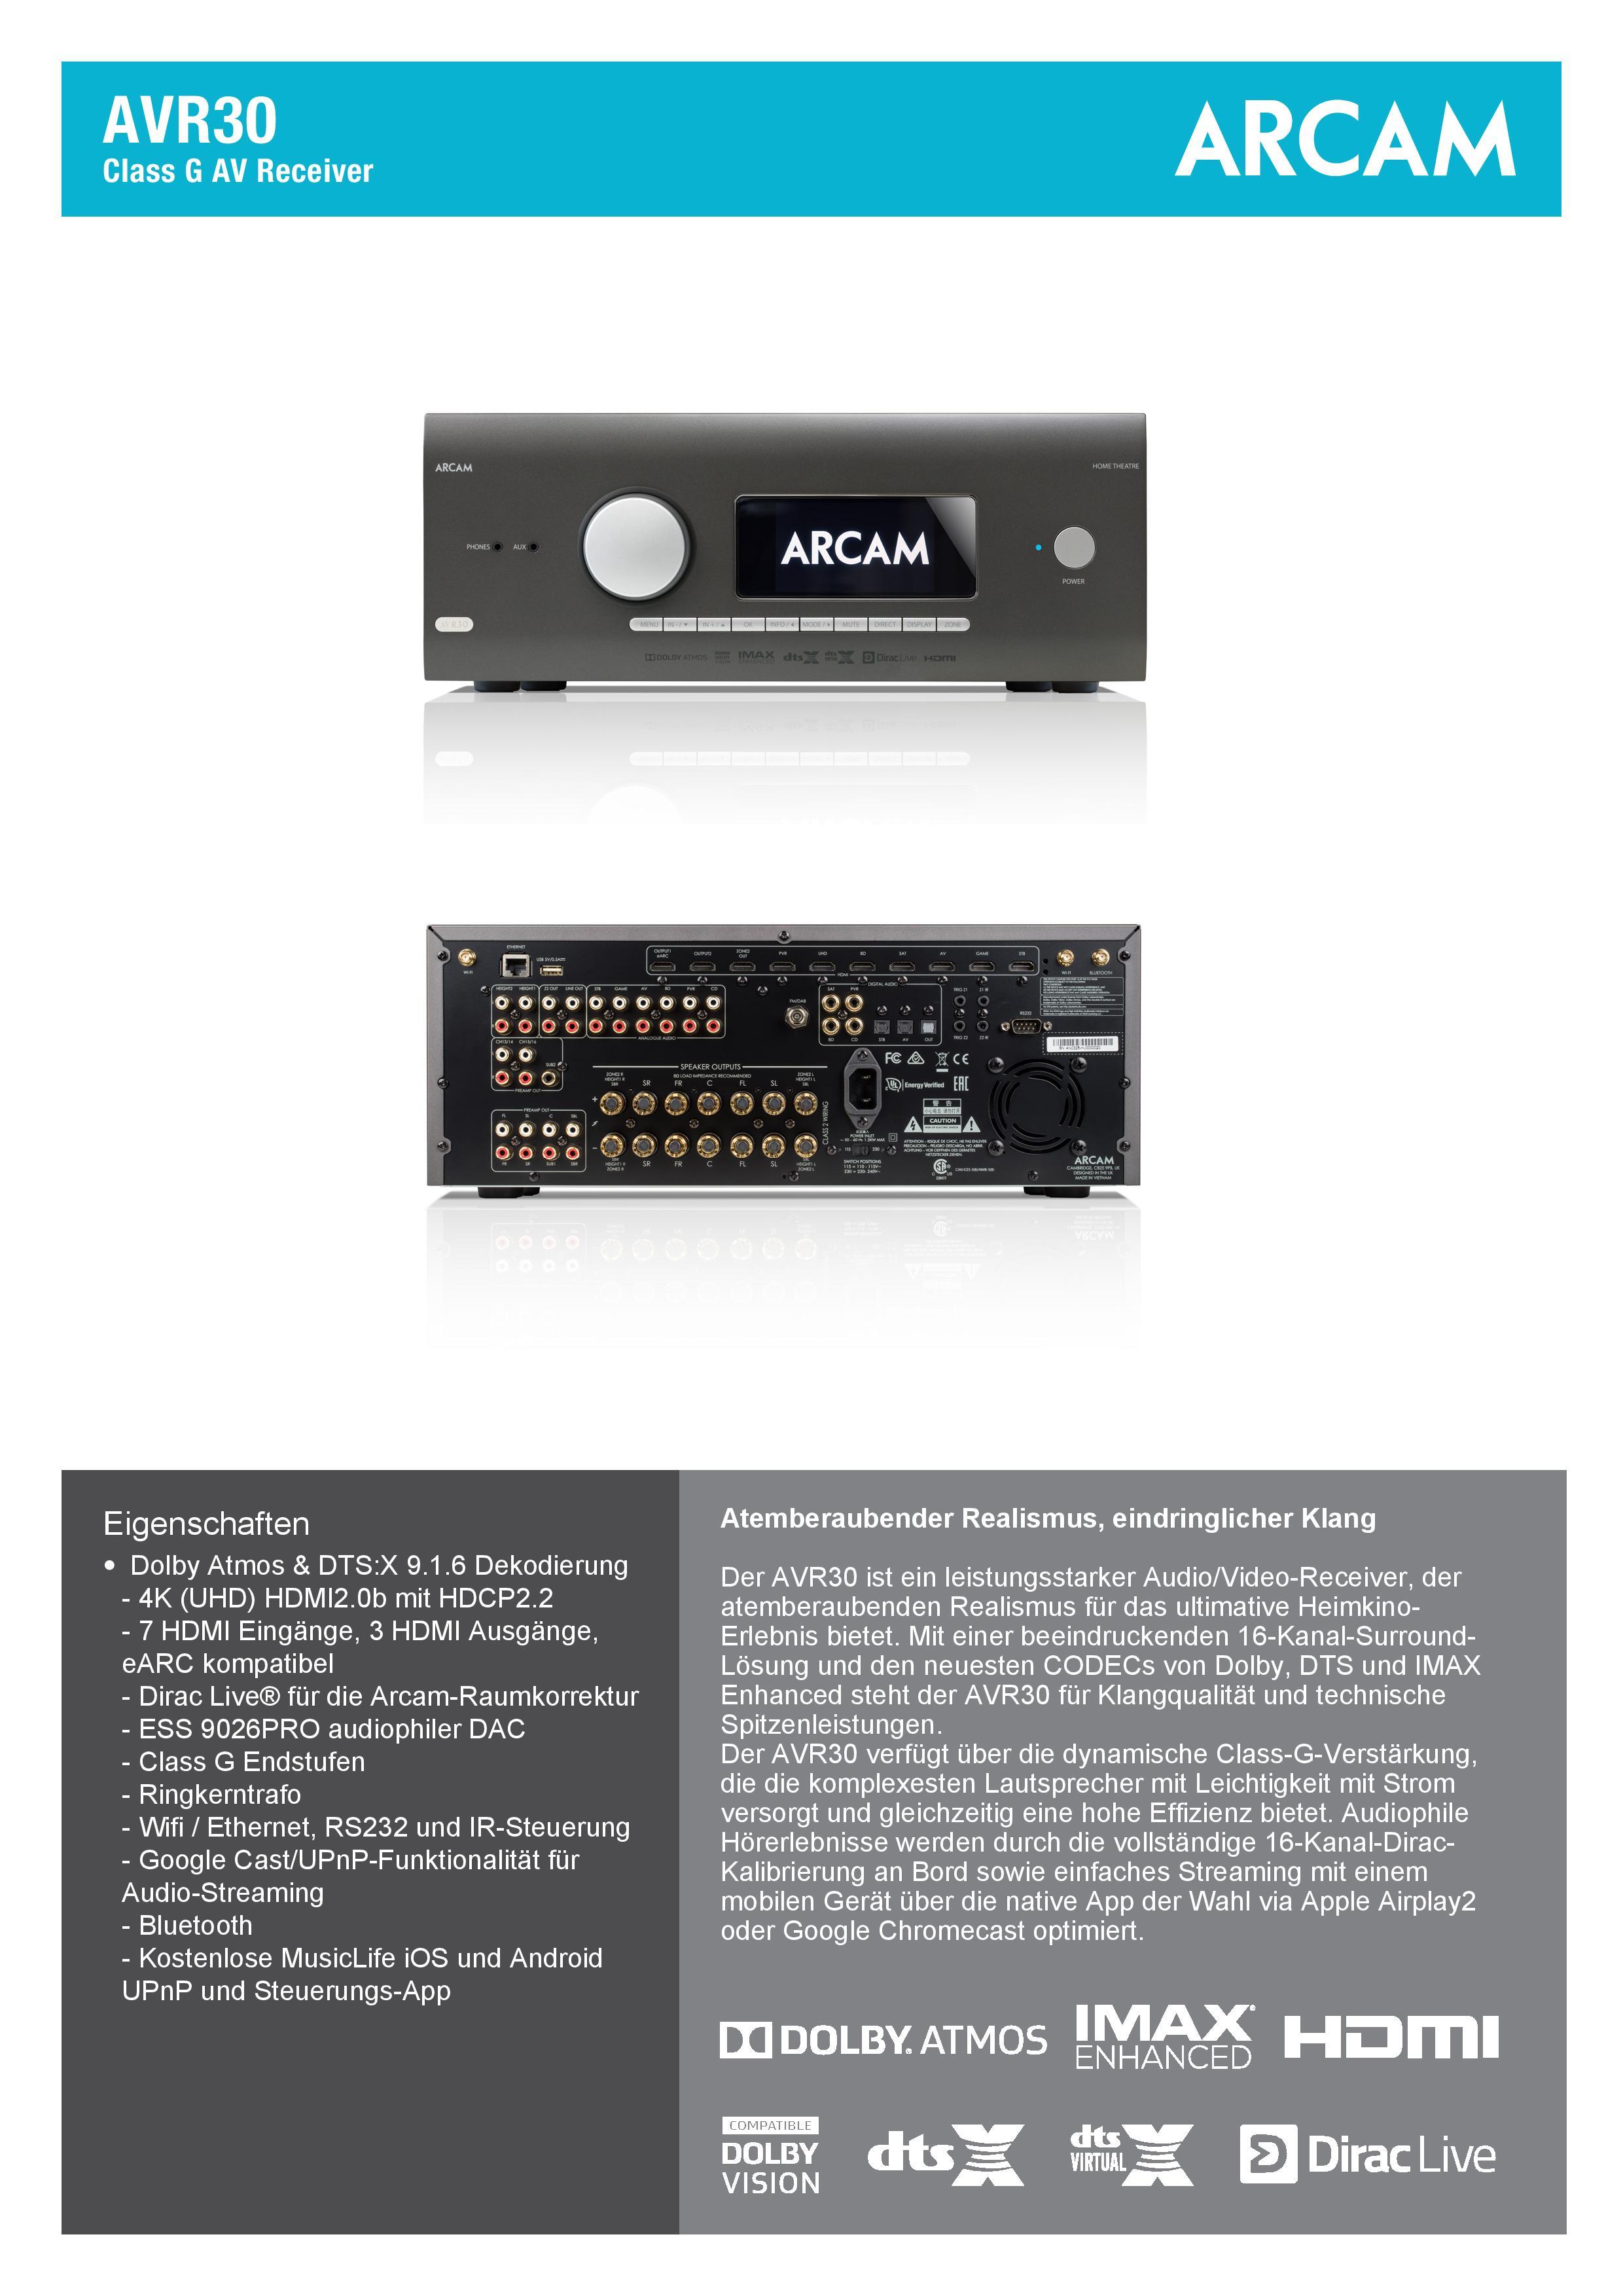 ARCAM-AVR30-Spec_DE-page-001